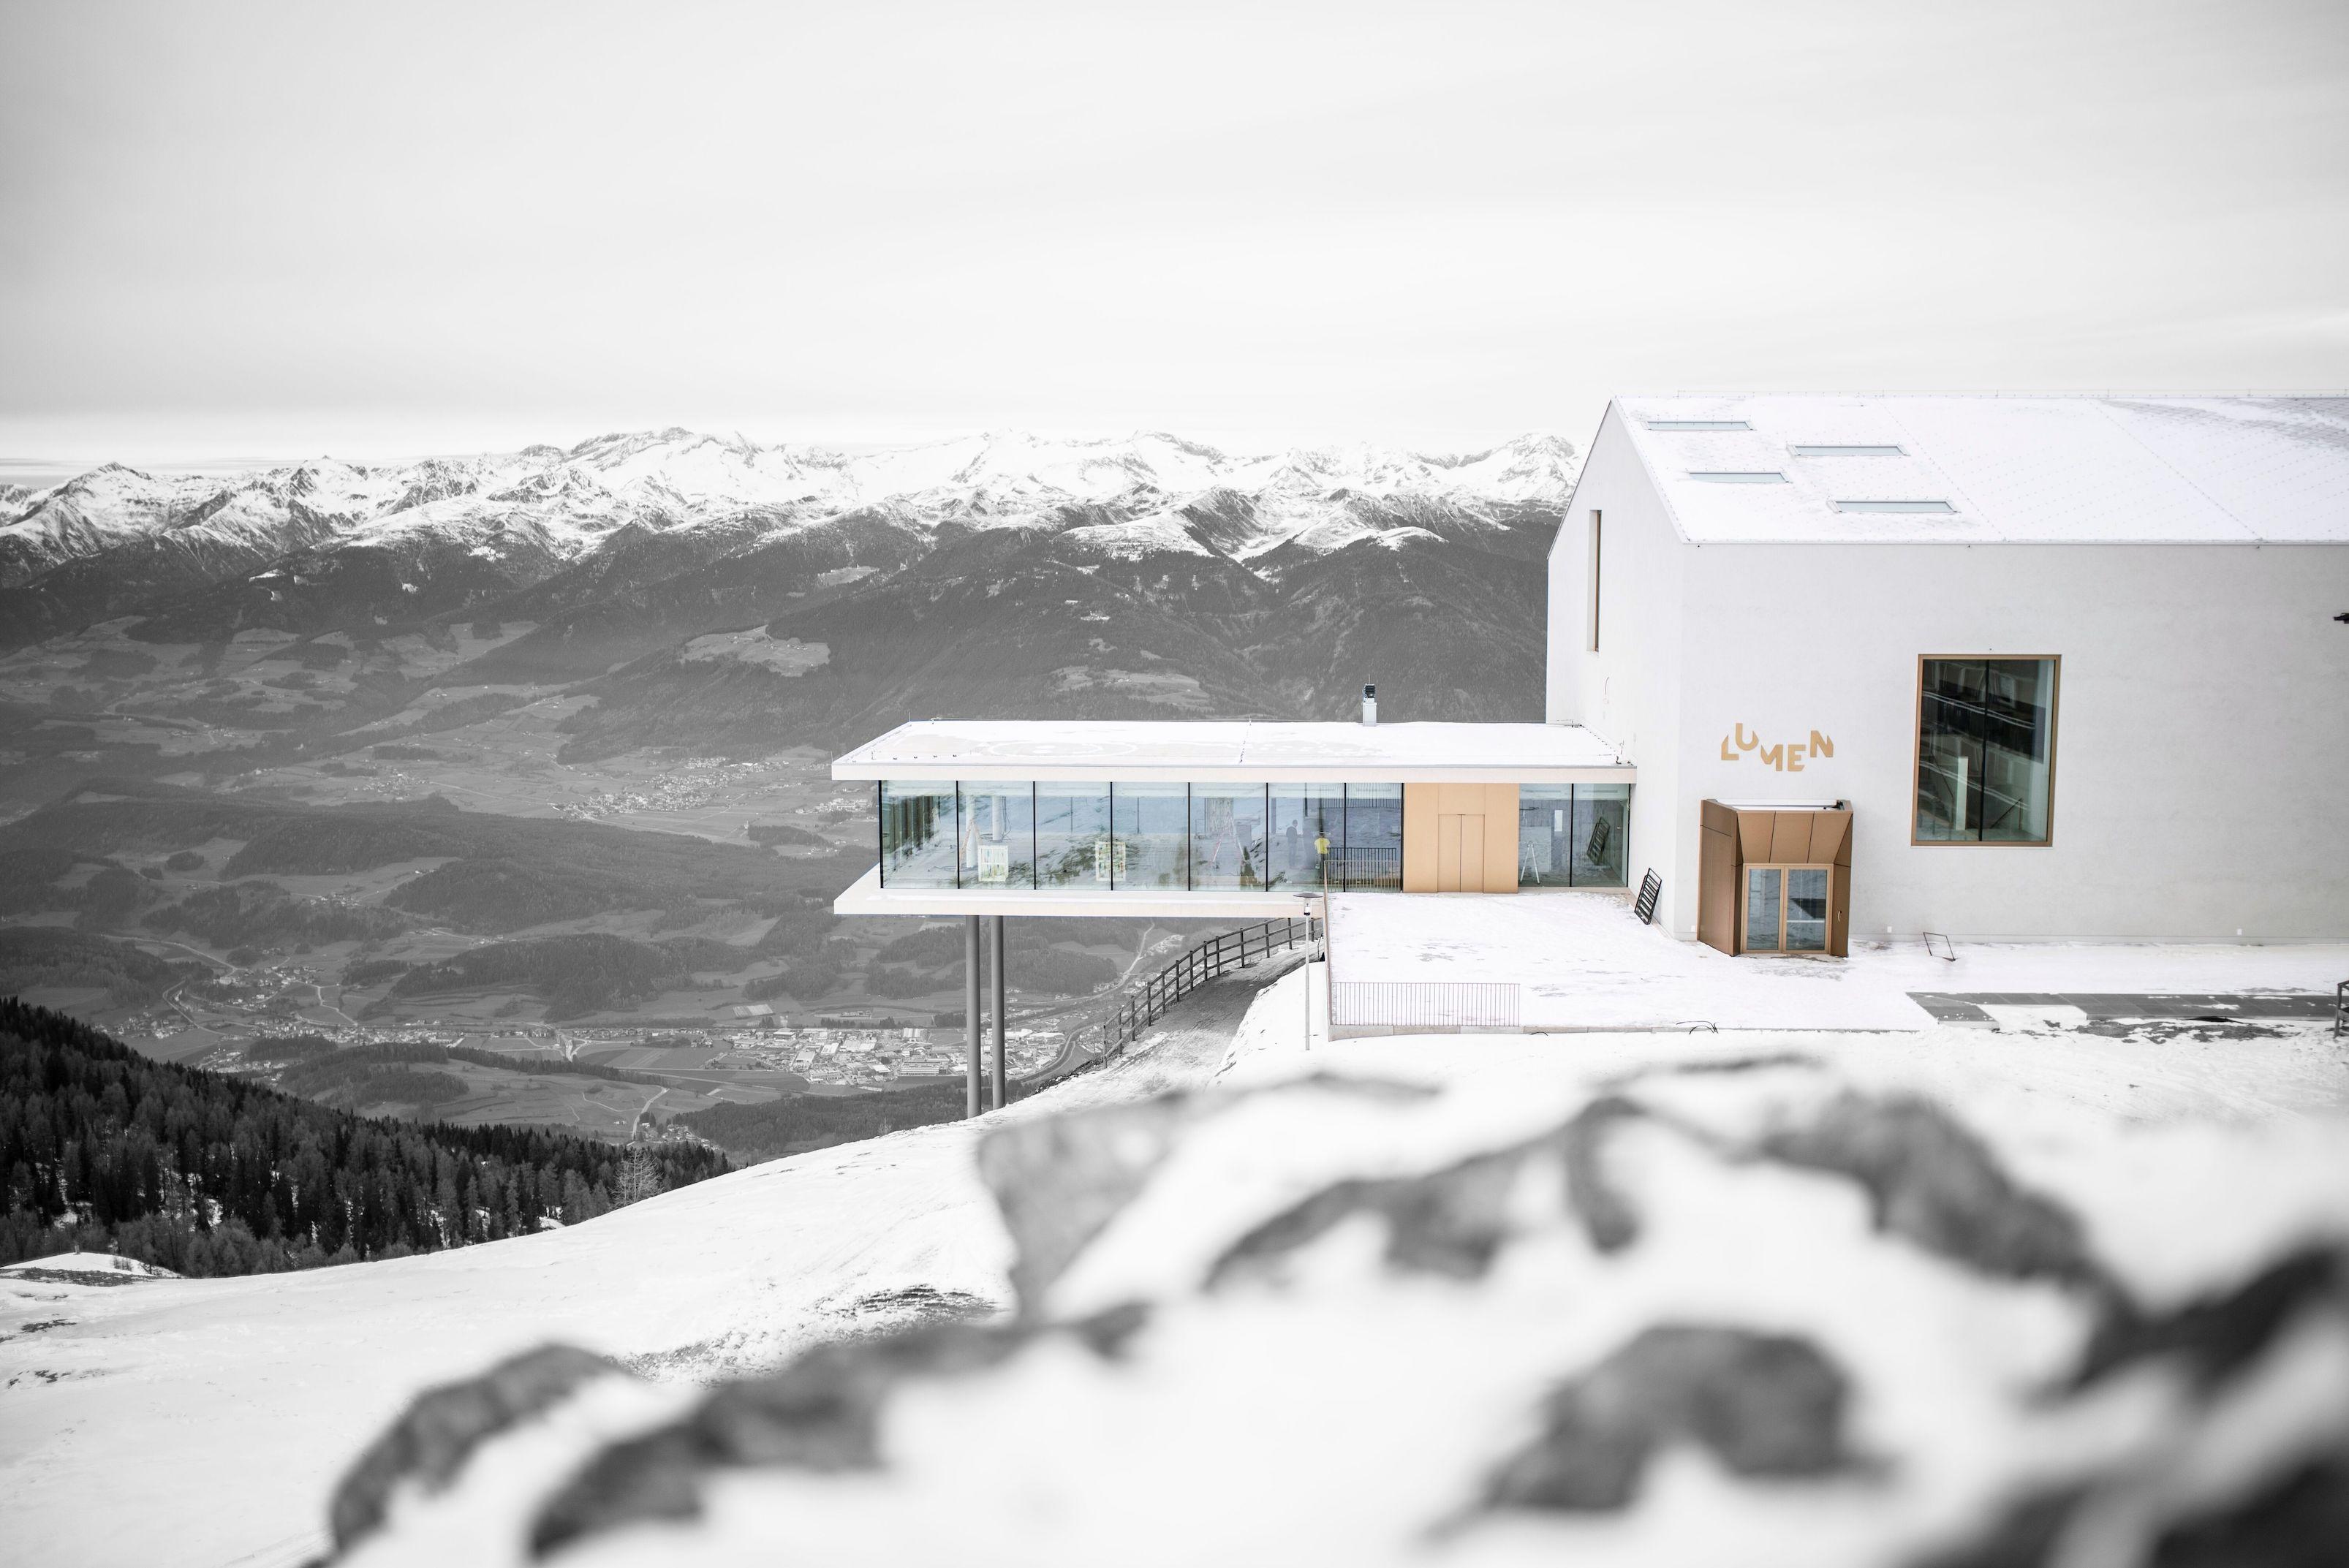 LUMEN museo di fotografia di montagna ©skirama Kronplatz